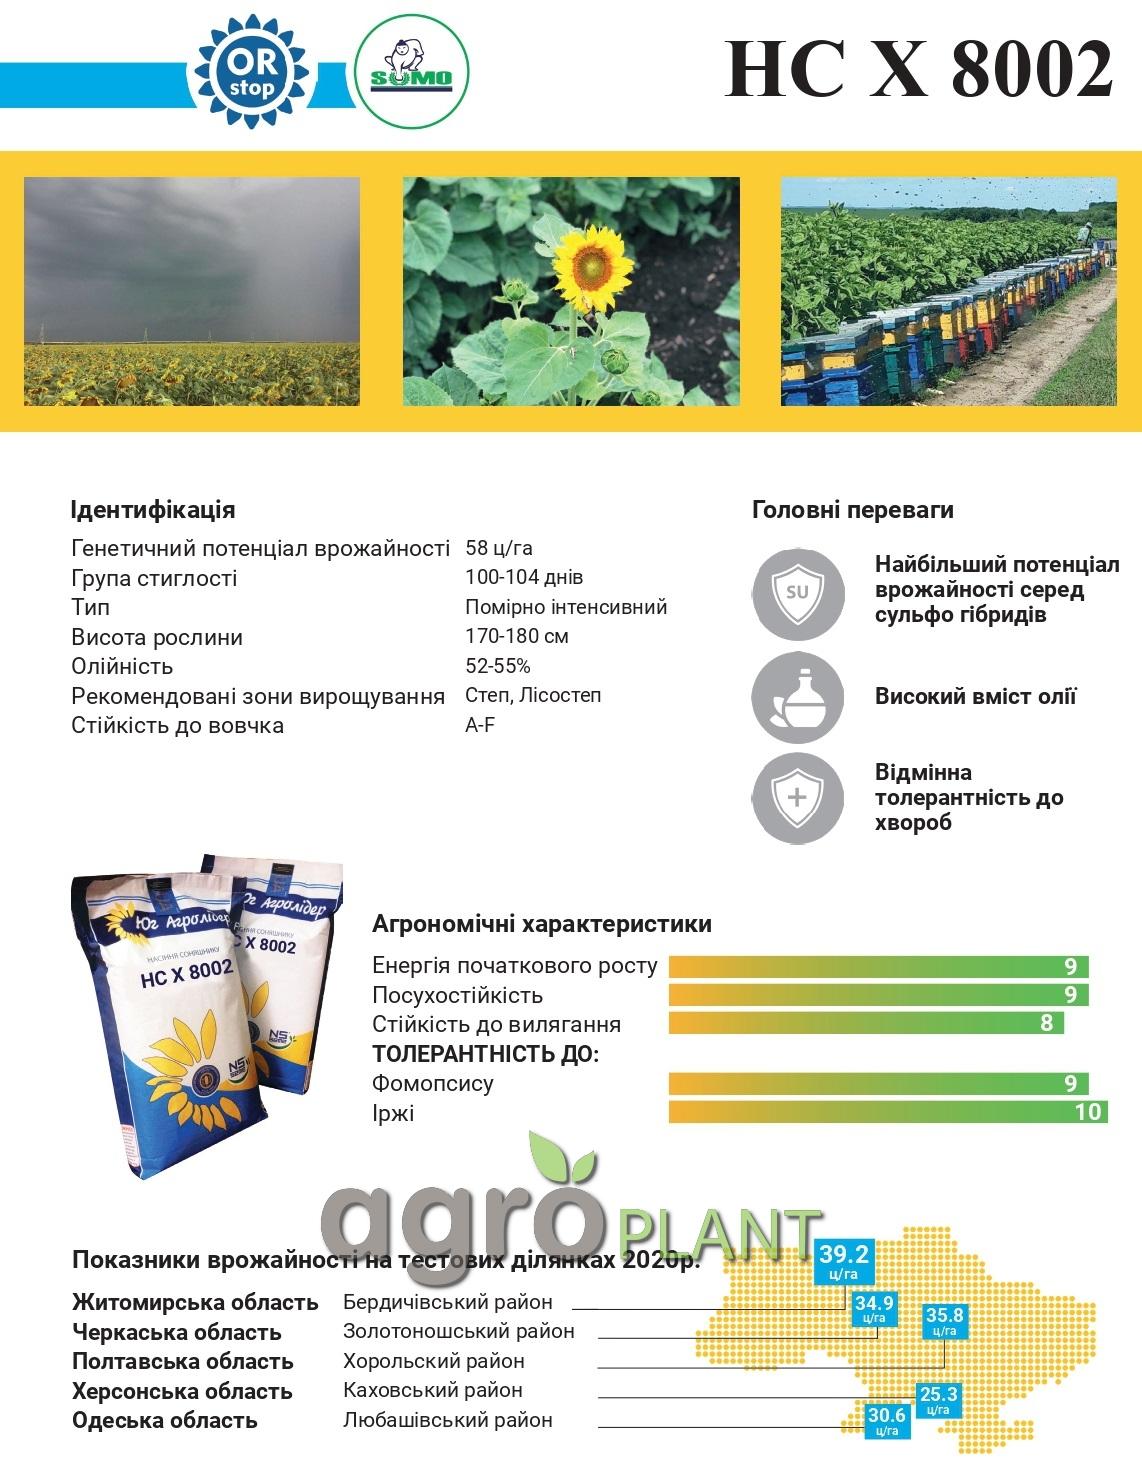 Семена Подсолнечника НС Х 8002 Описание и Характеристика